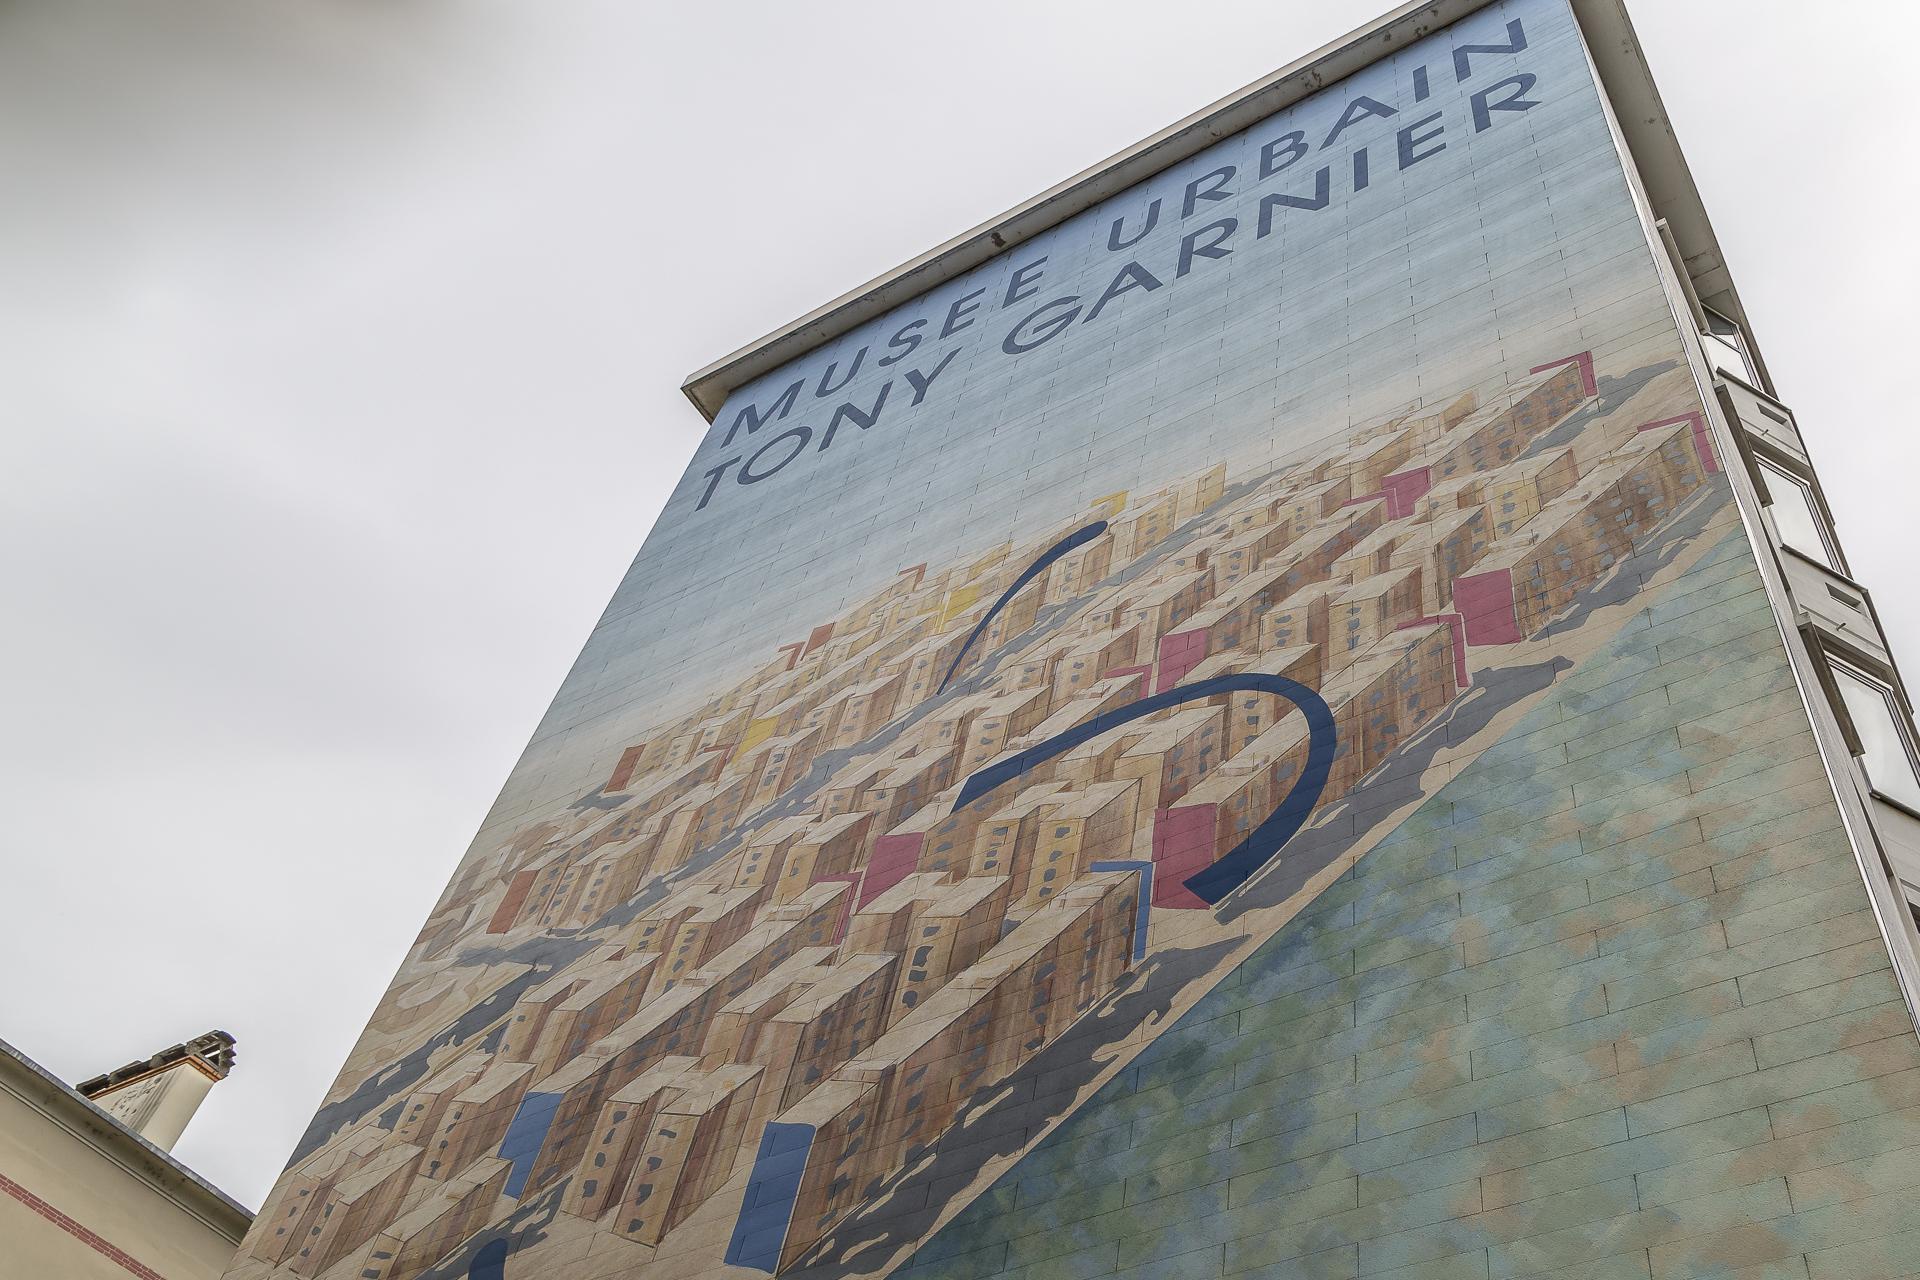 musee-urbain-tony-garnier-1